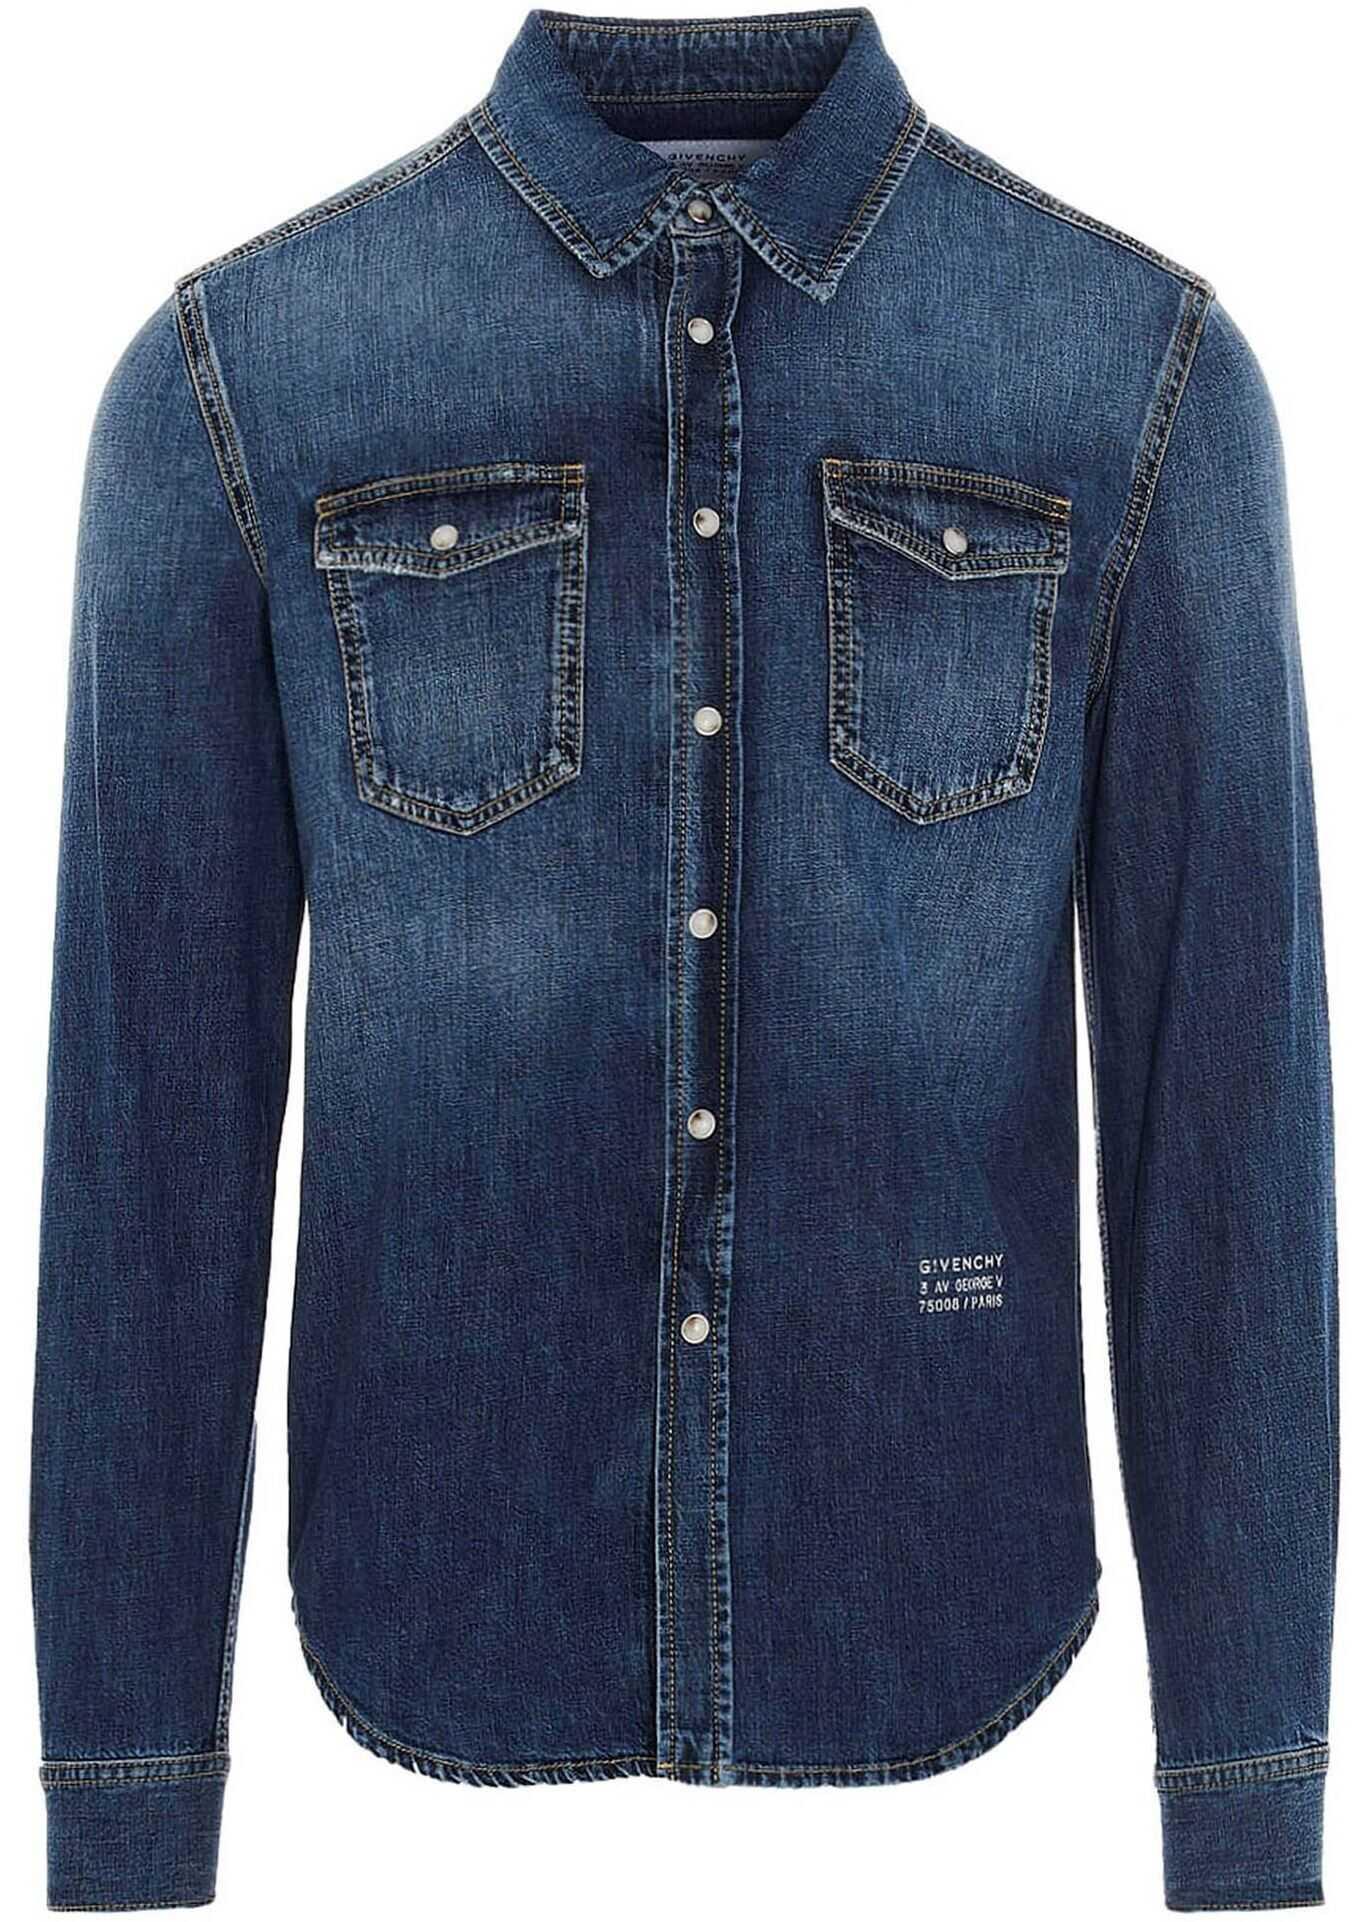 Givenchy Denim Shirt In Blue Blue imagine